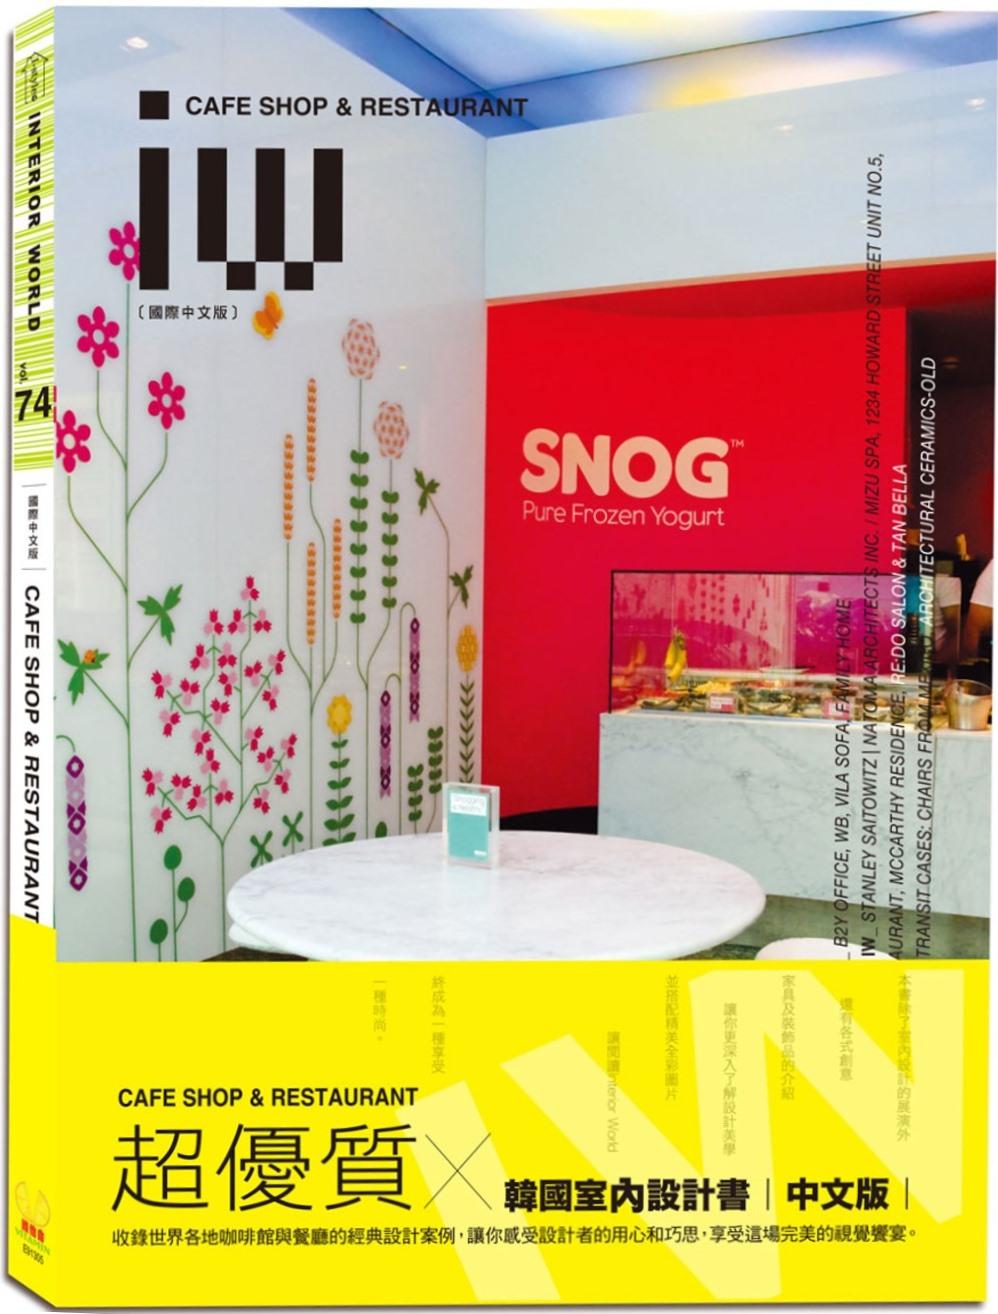 Interior World vol.74 國際中文版 食飲空間 Cafe Shop & Restaurant